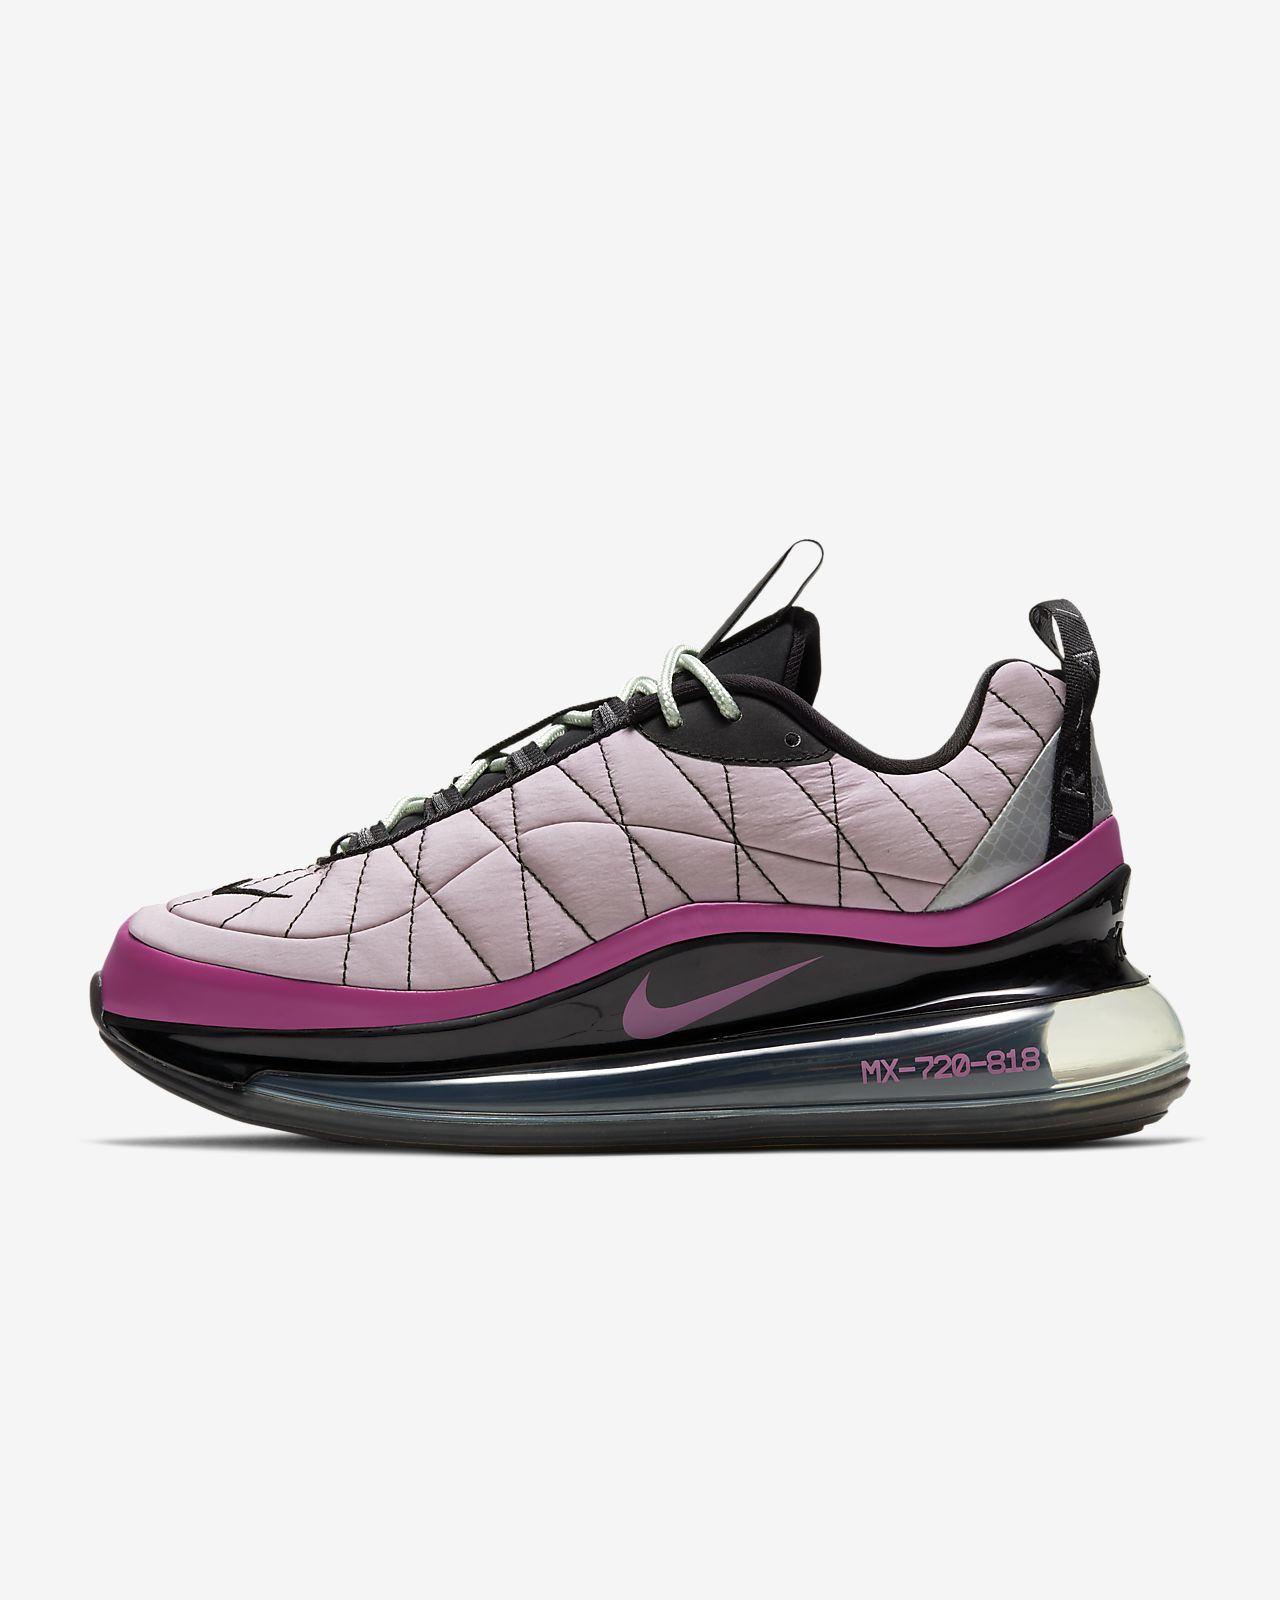 Nike MX-720-818 女子运动鞋